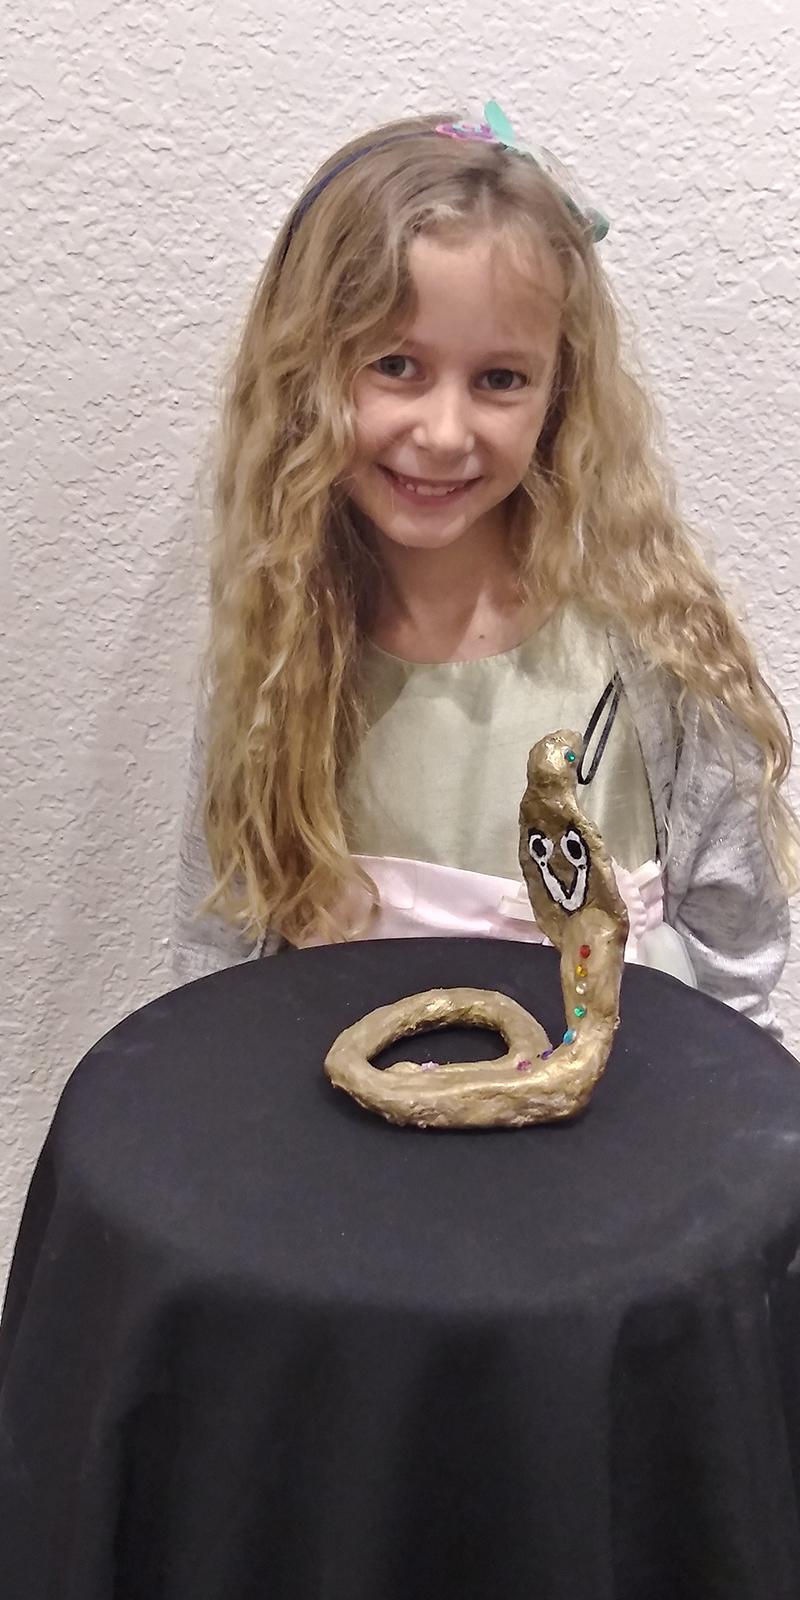 Cobra by Alice, age 7